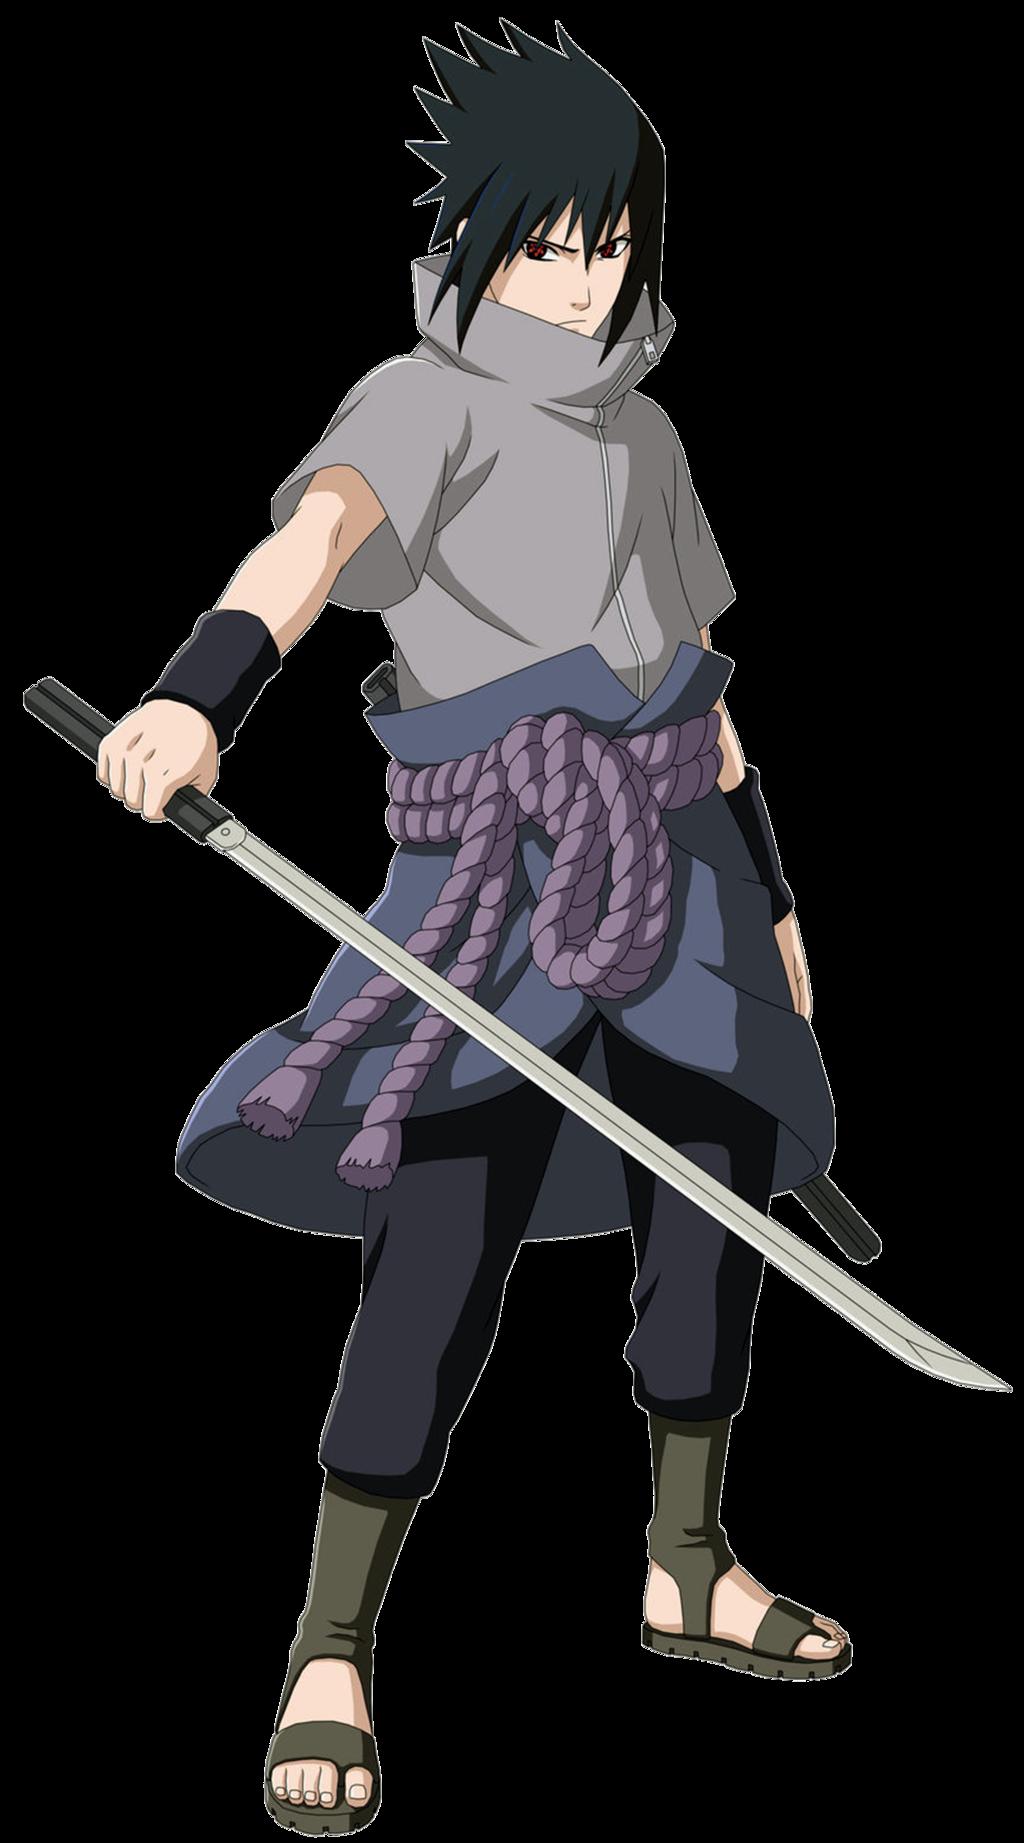 Uchiha Sasuke PNG Transparent Image